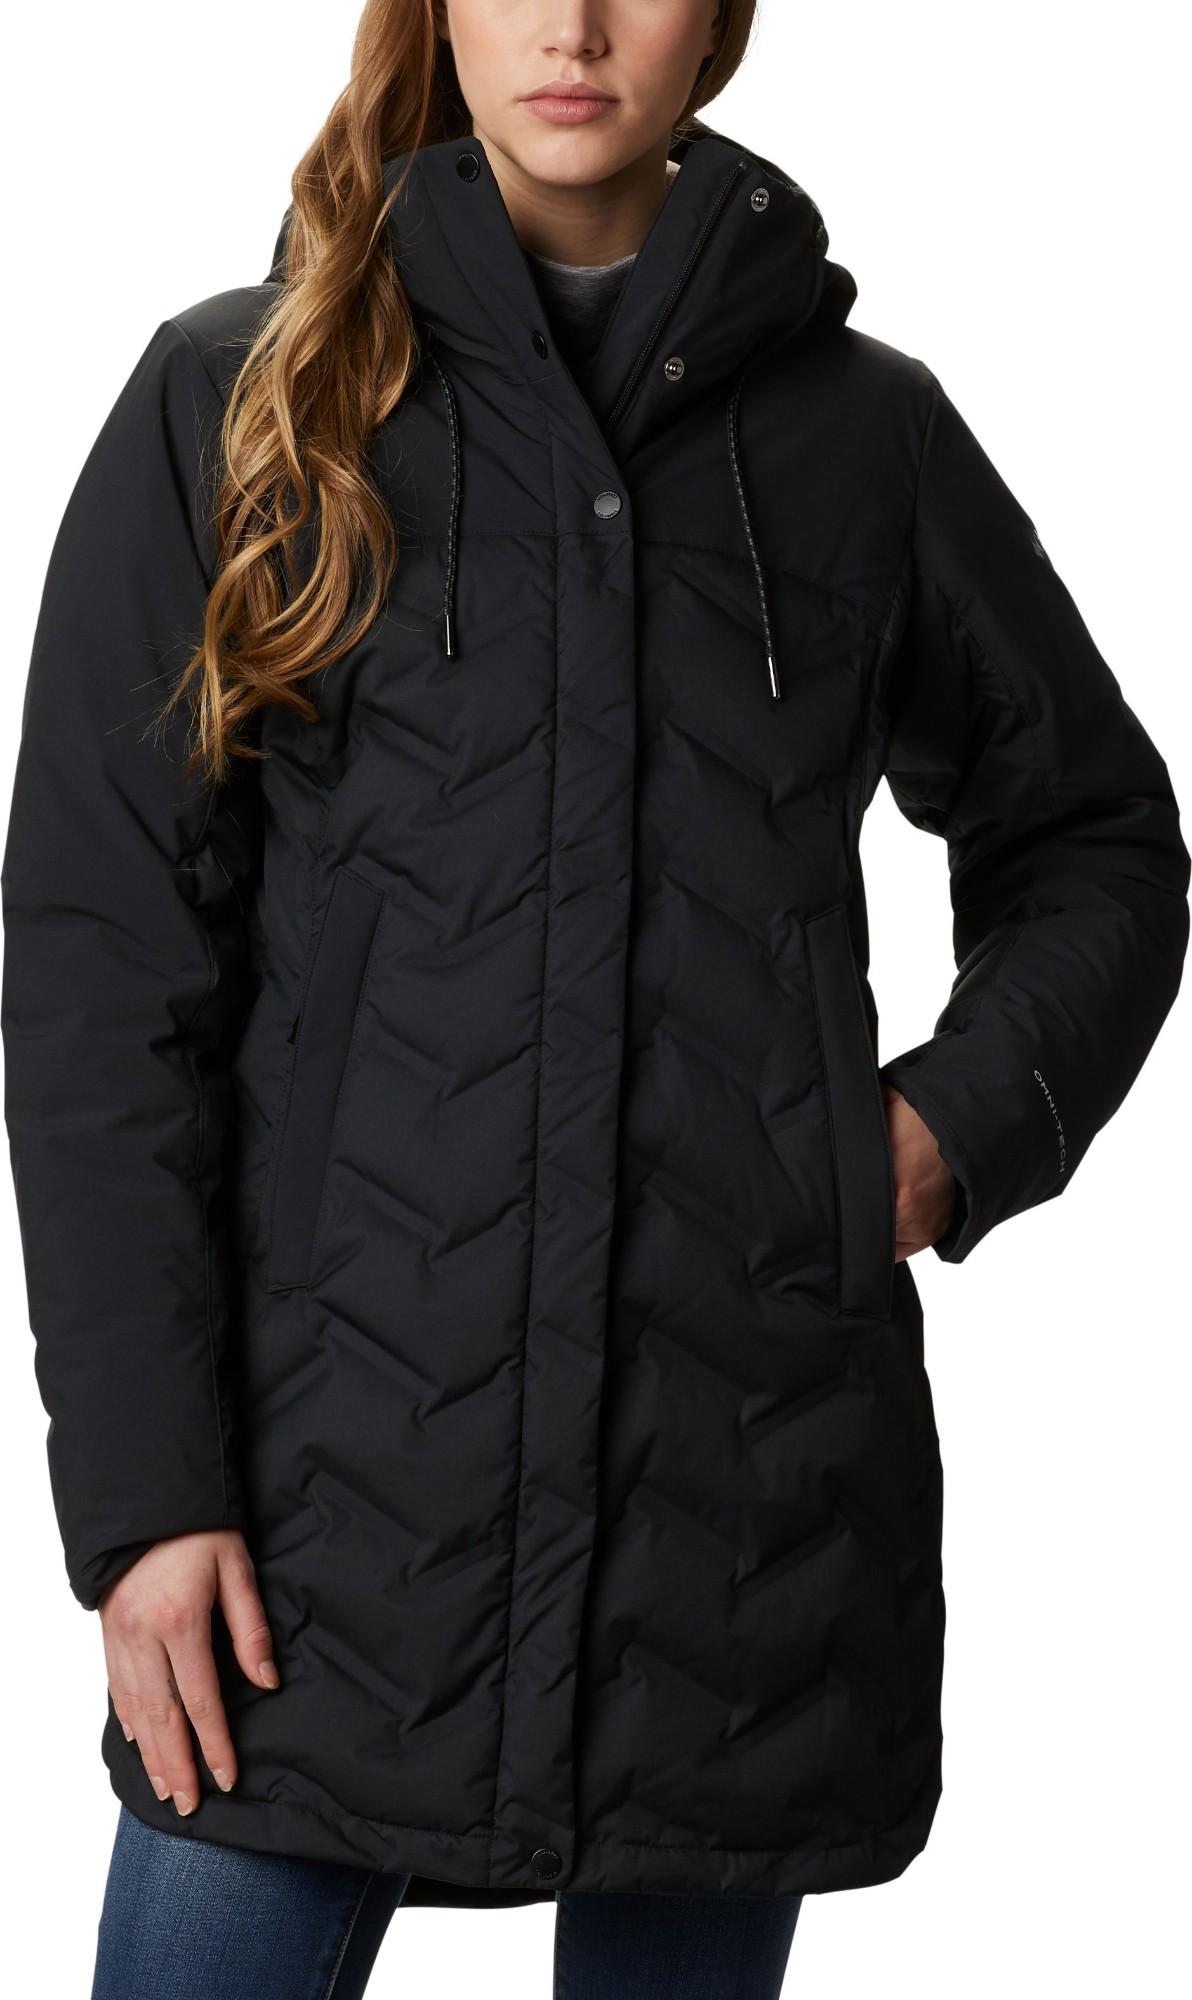 Columbia Mountain Croo Long Down Jacket Women's Black M